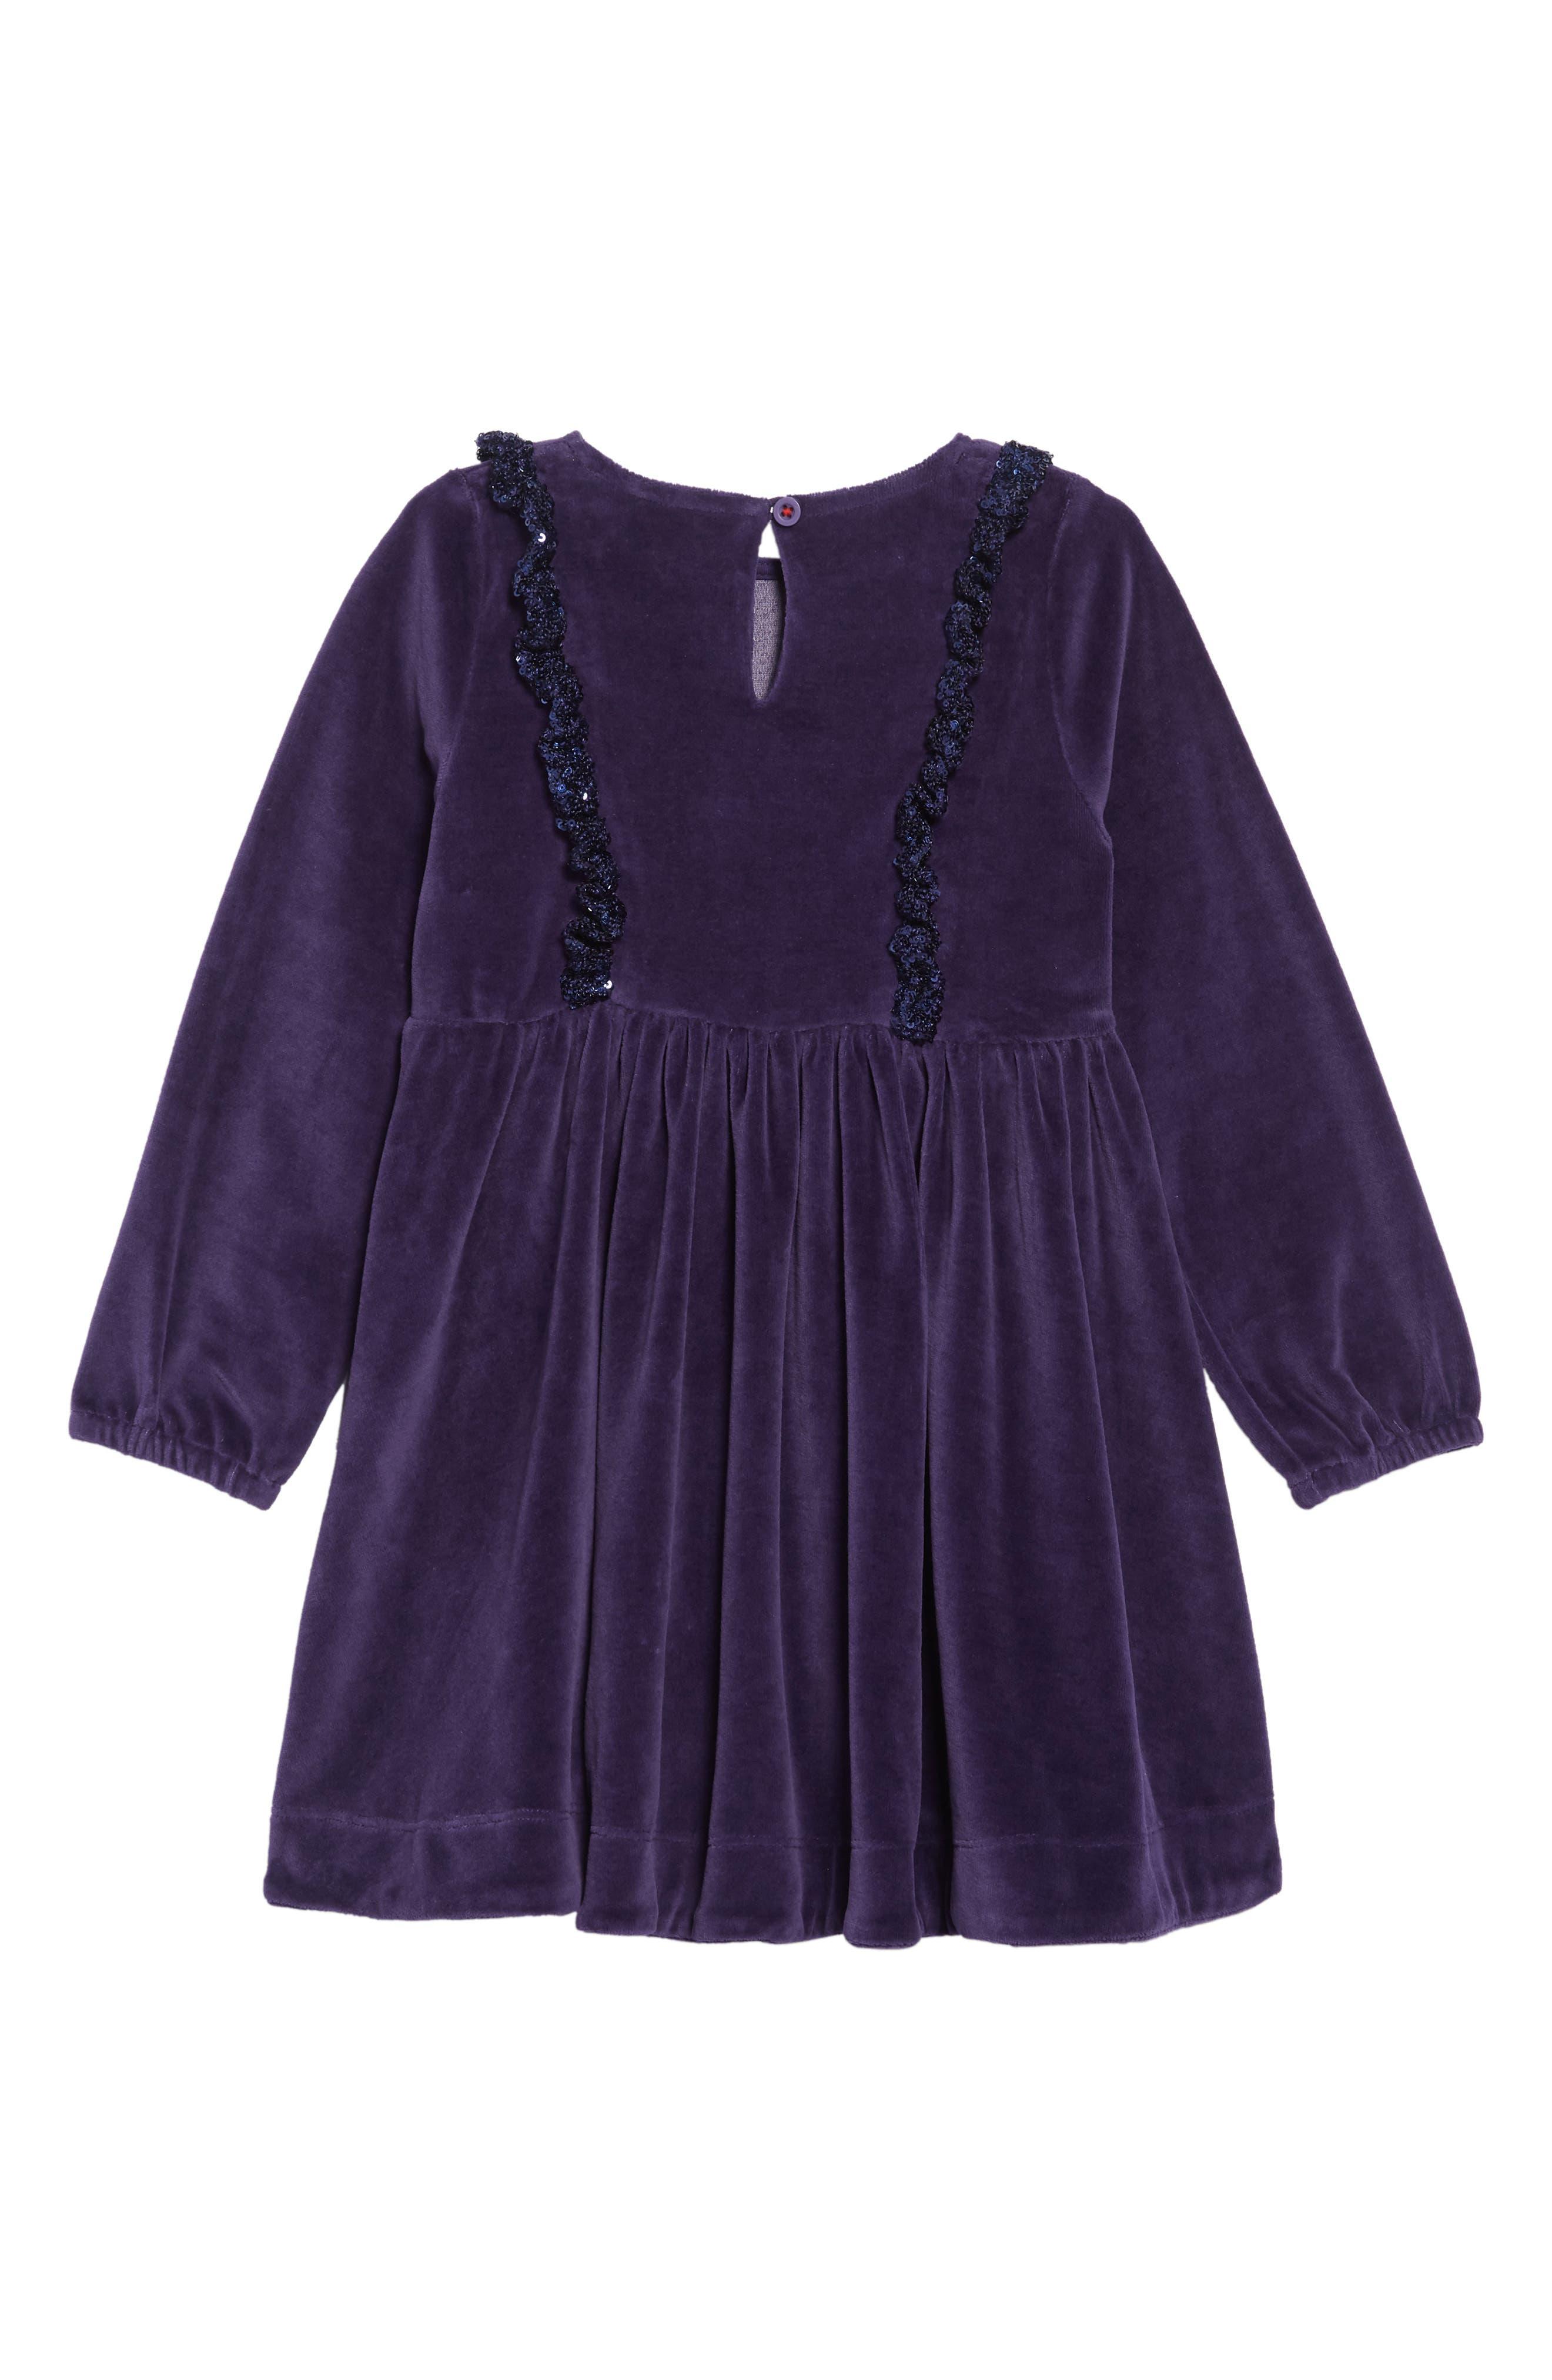 Festive Velour Dress,                             Alternate thumbnail 2, color,                             BLU PRUSSIAN BLUE